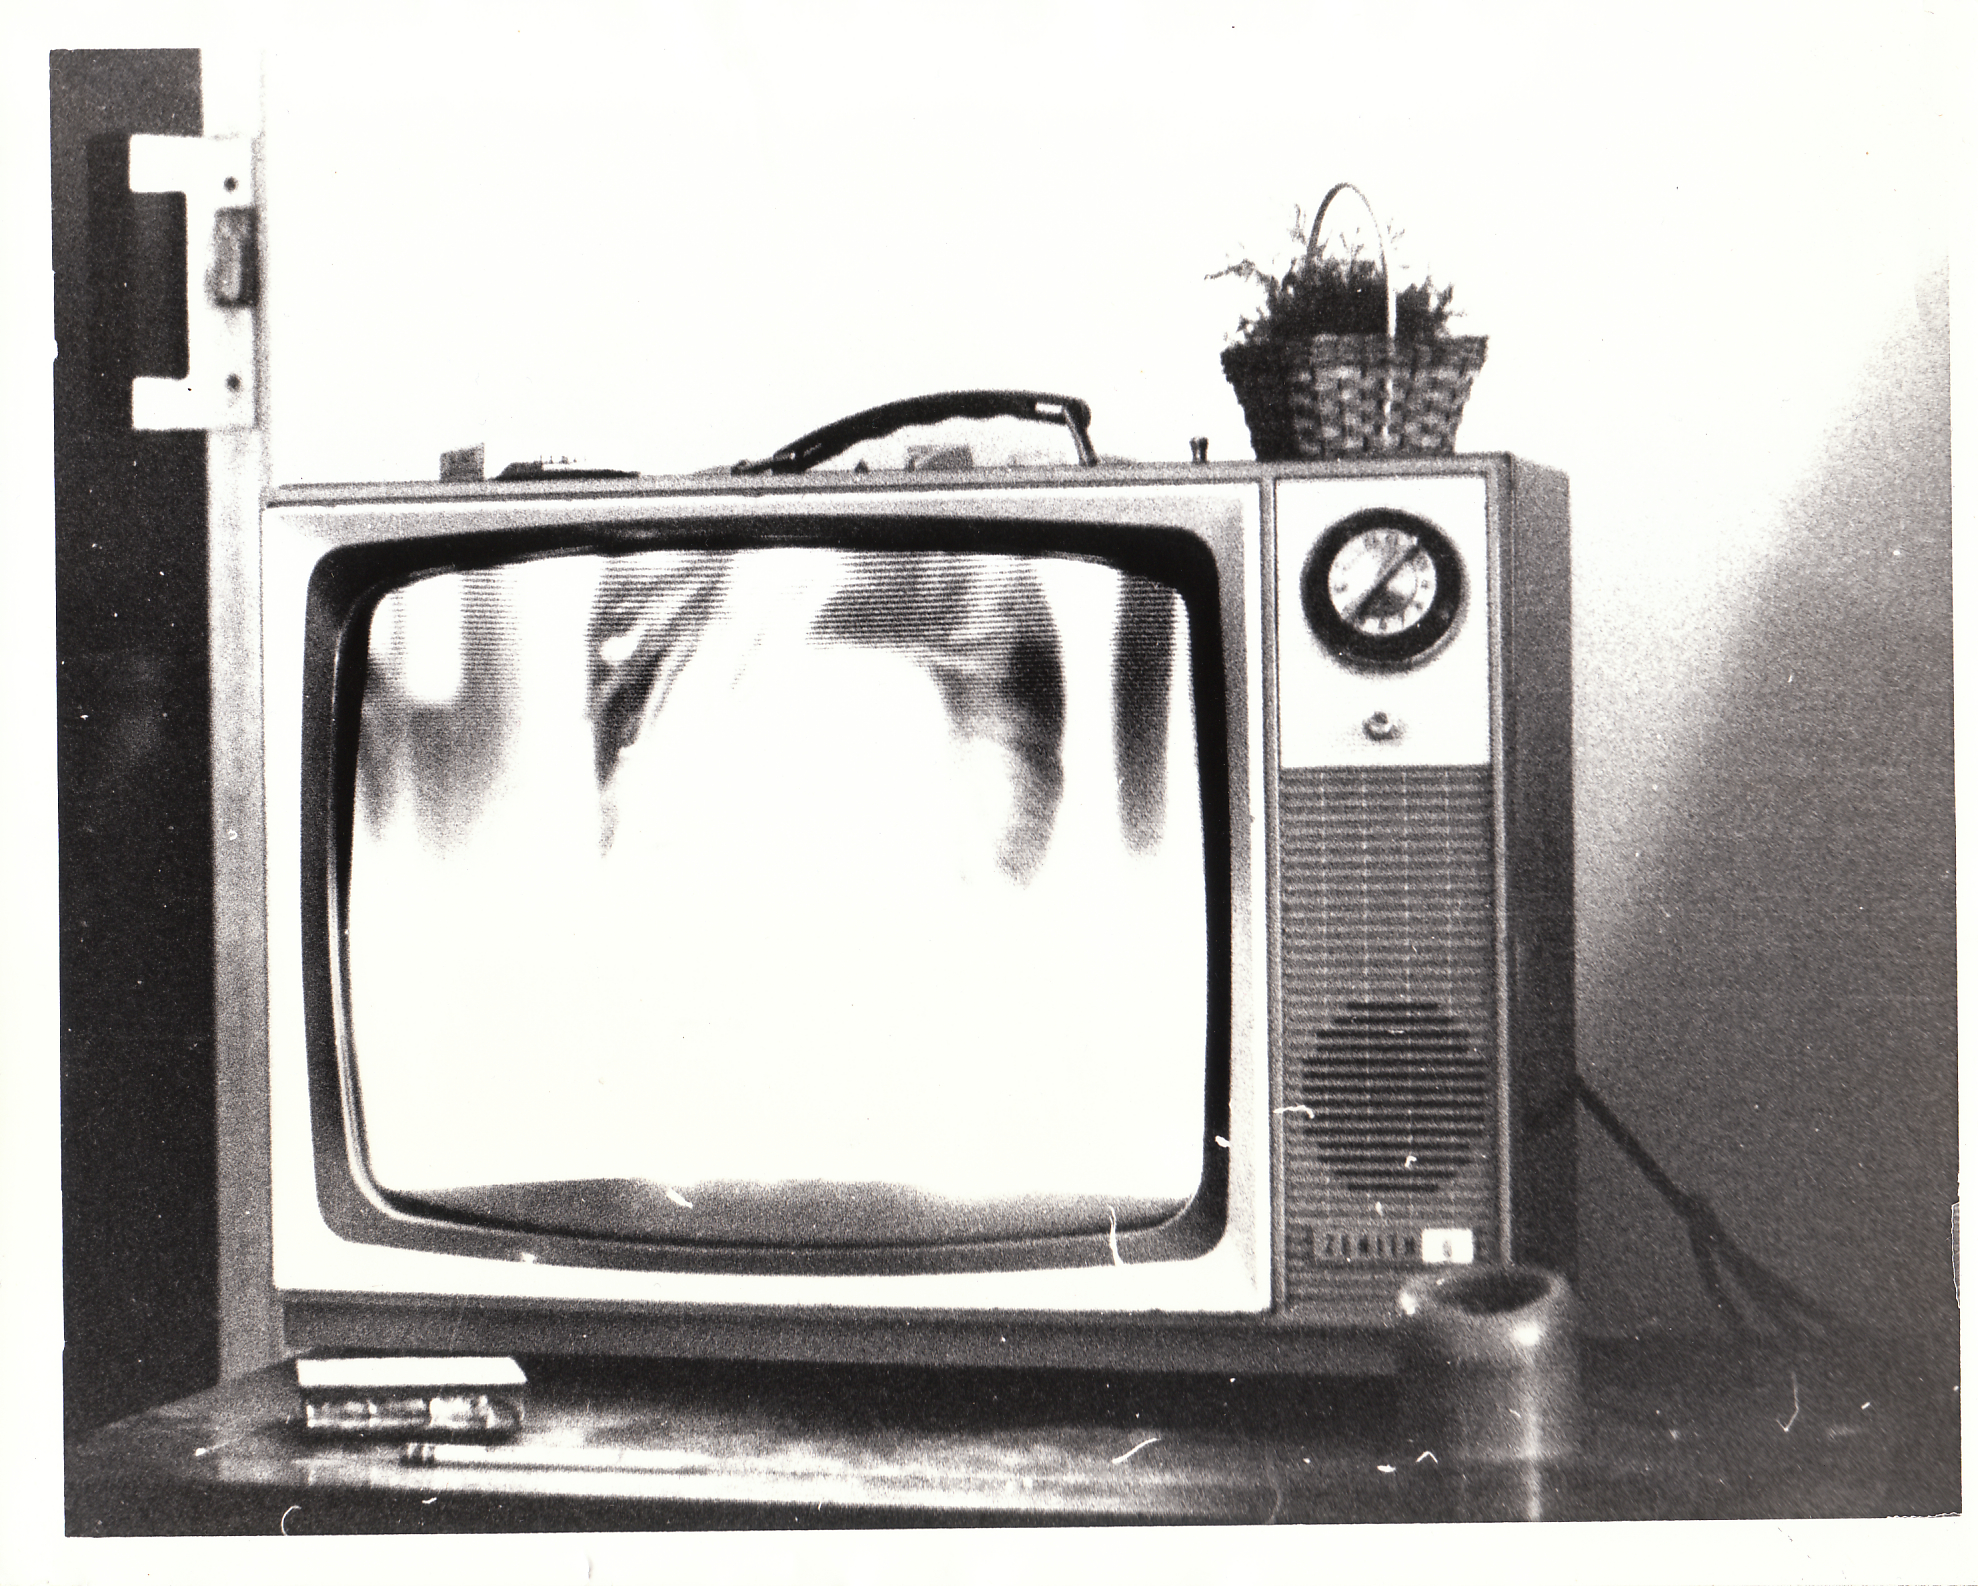 "McGarrett Empire Makers_1,  photograph   (1/1), 1981  , 8 x 10""   Copyright © Tennyson Woodbridge, 1963 to present"